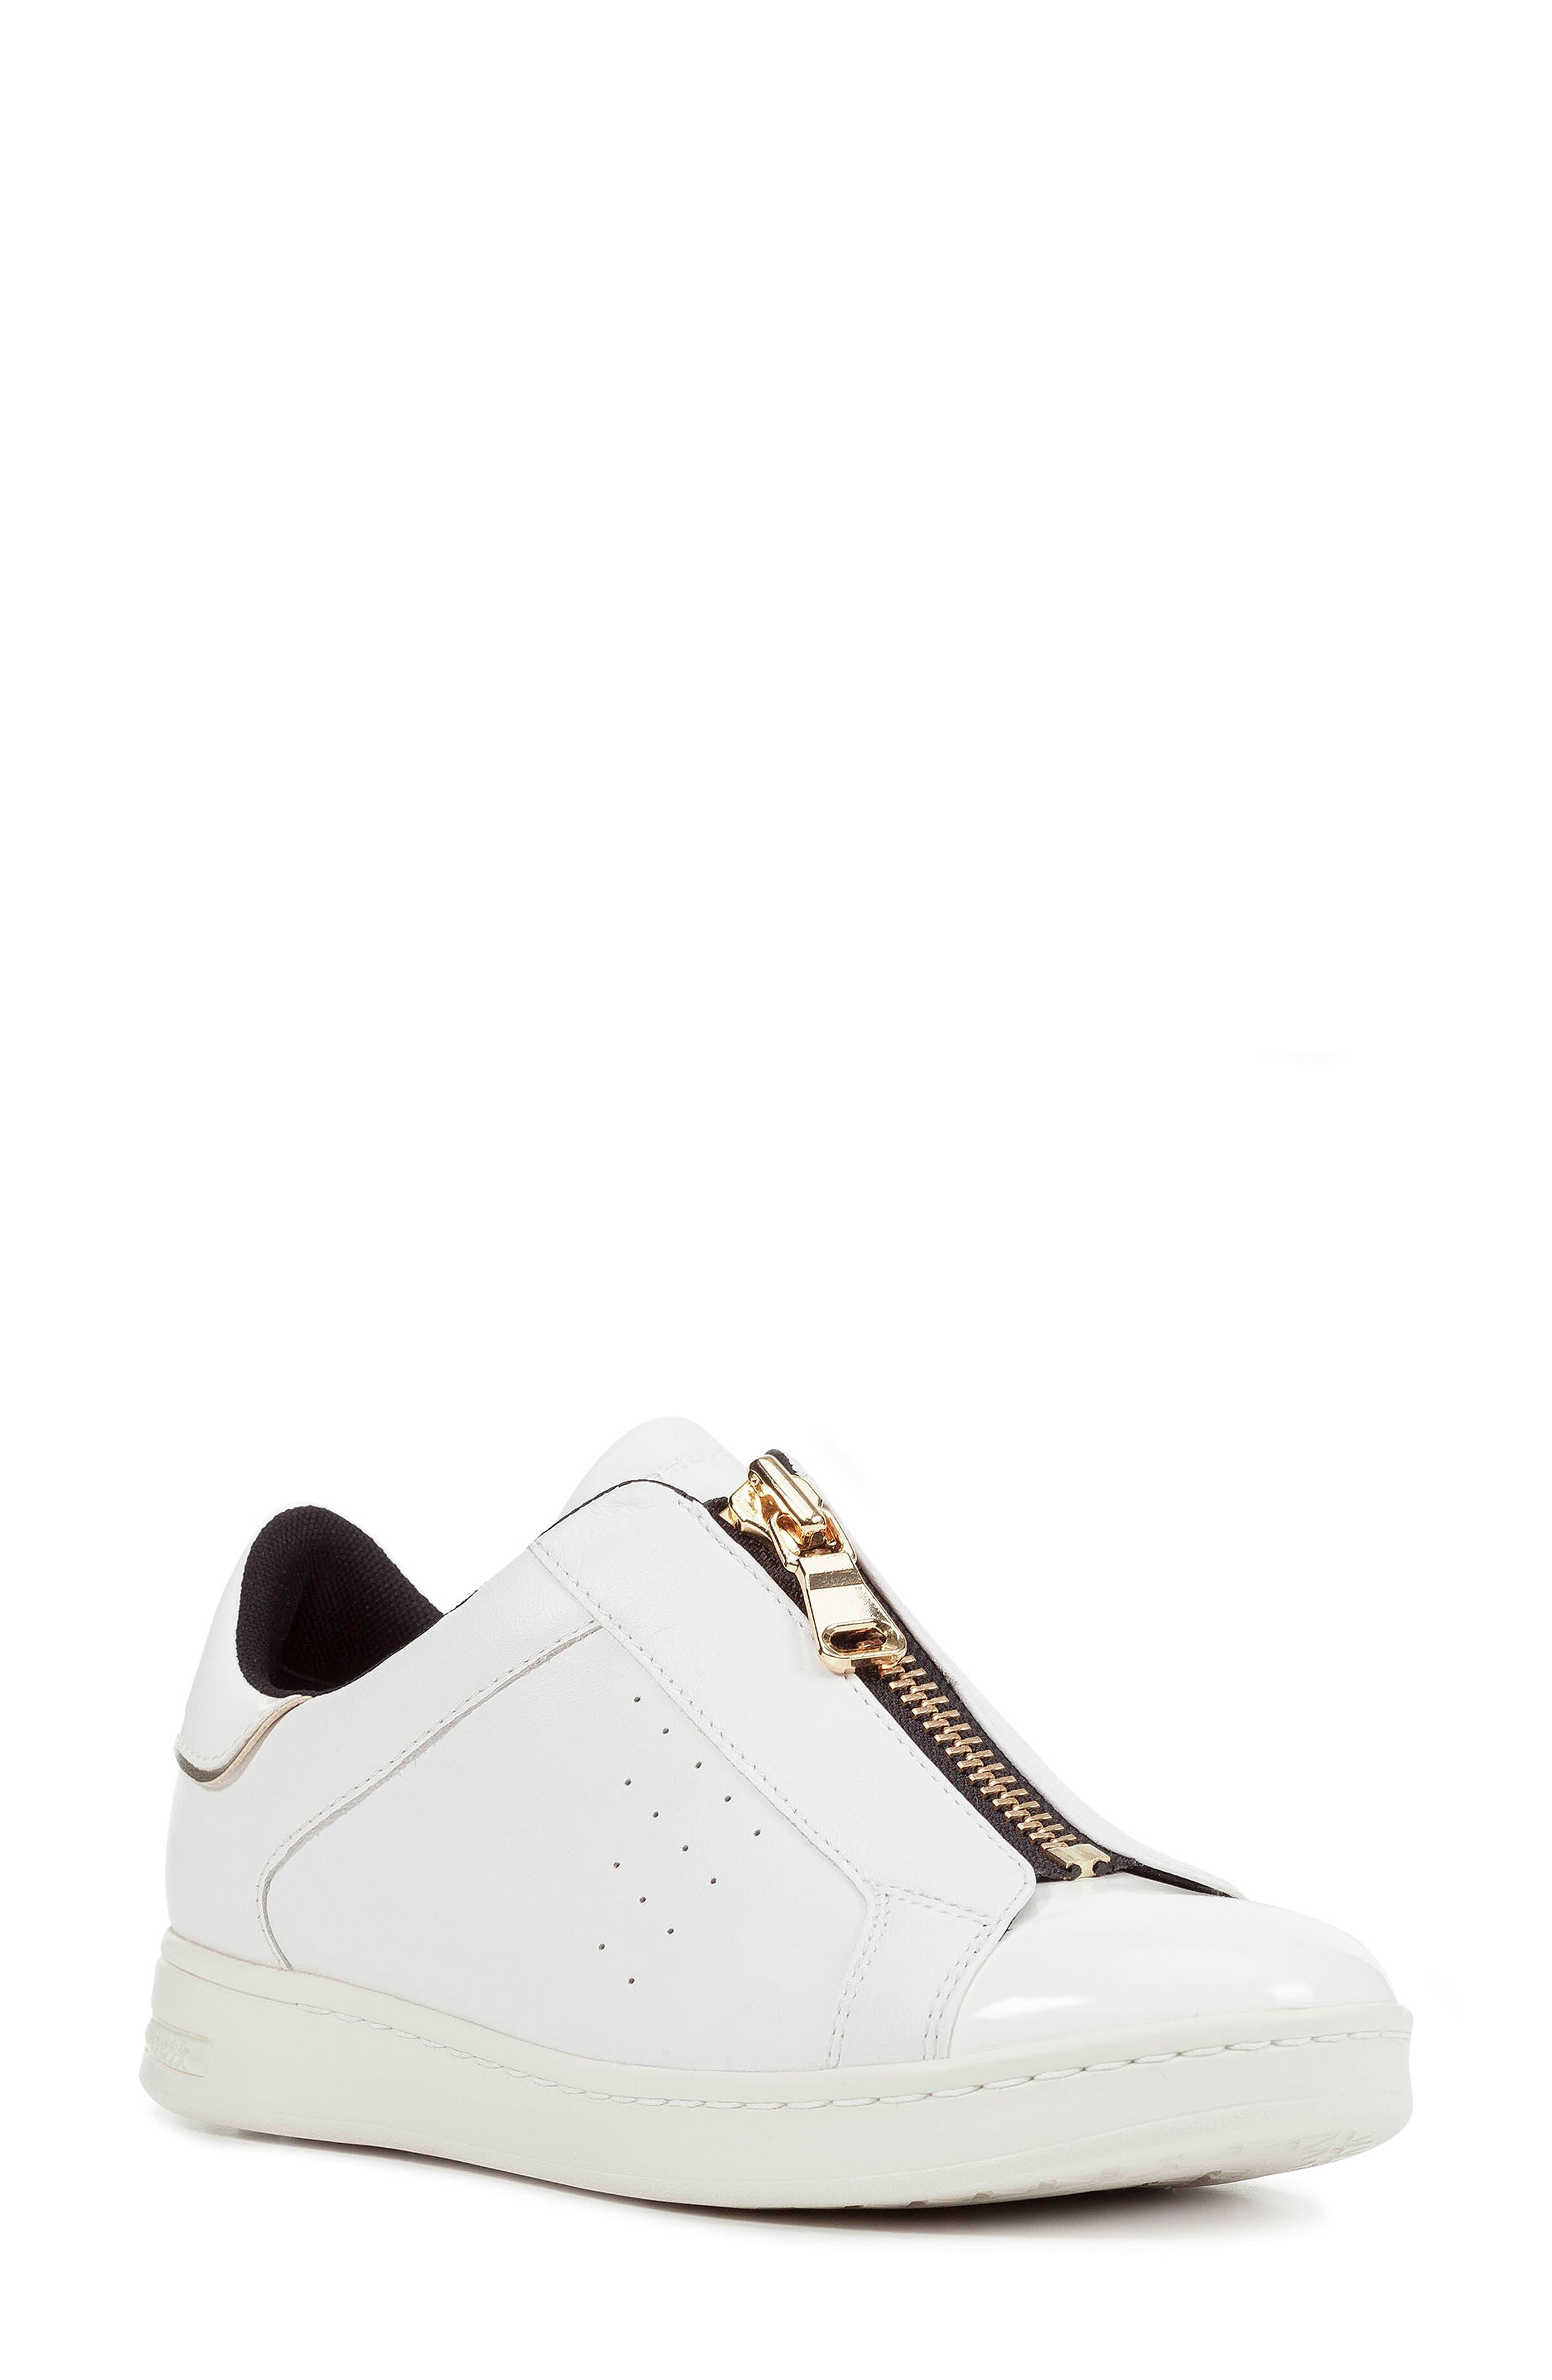 Jaysen Sneaker,                         Main,                         color, WHITE LEATHER